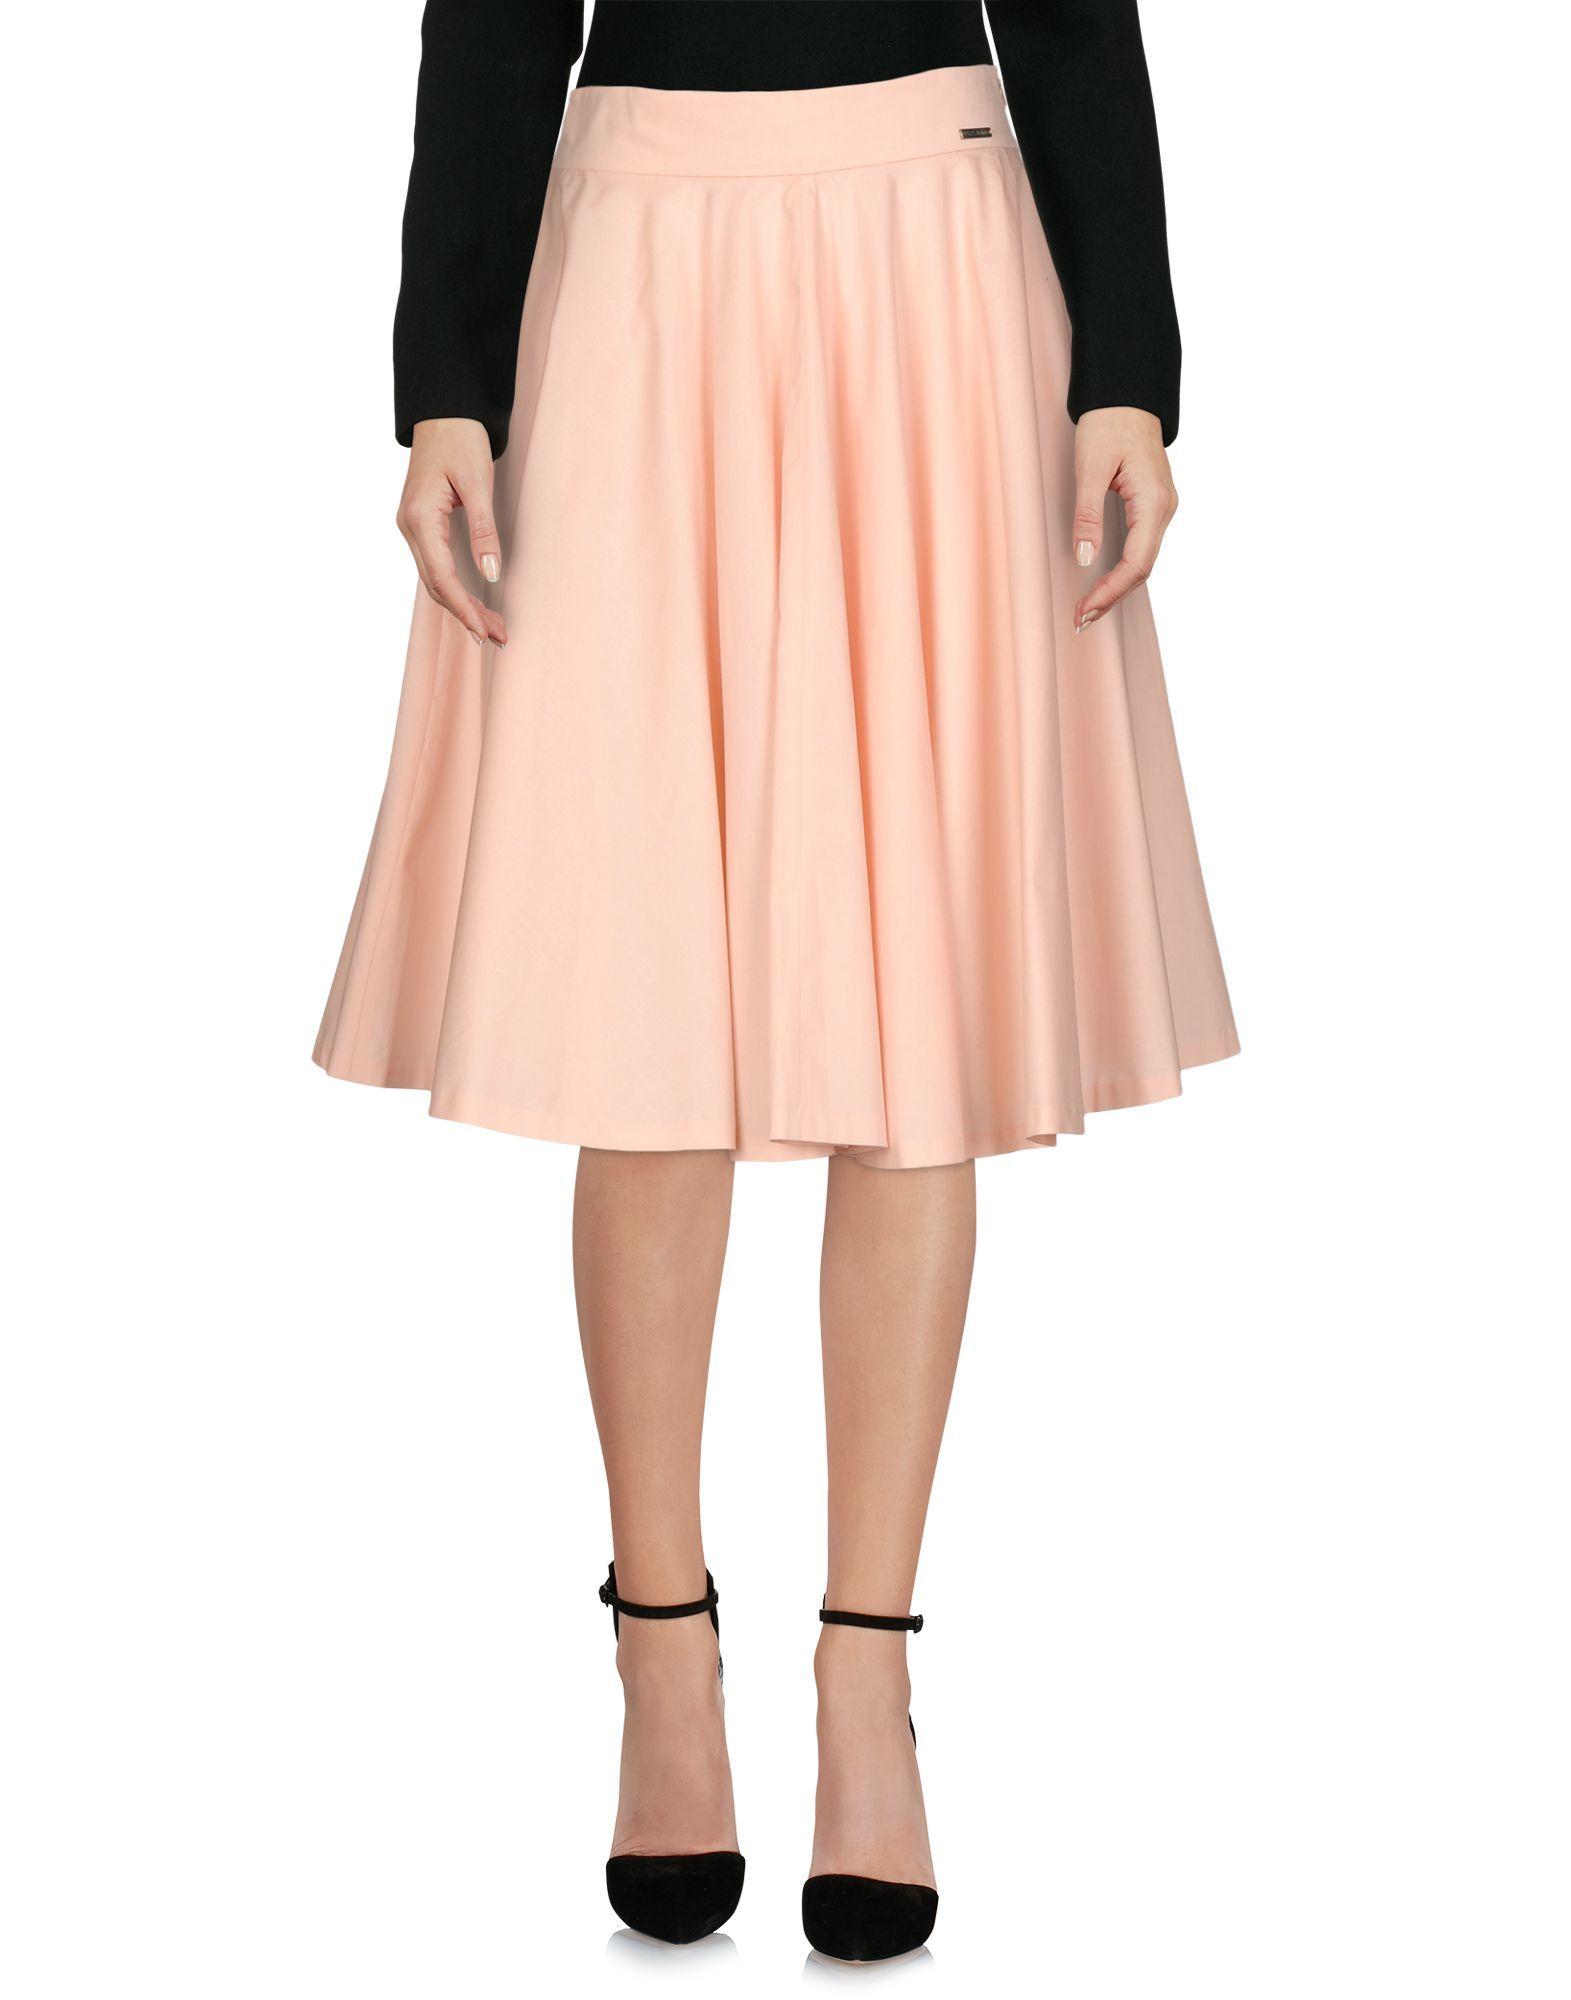 Pepe Jeans Pink Cotton Poplin Skirt